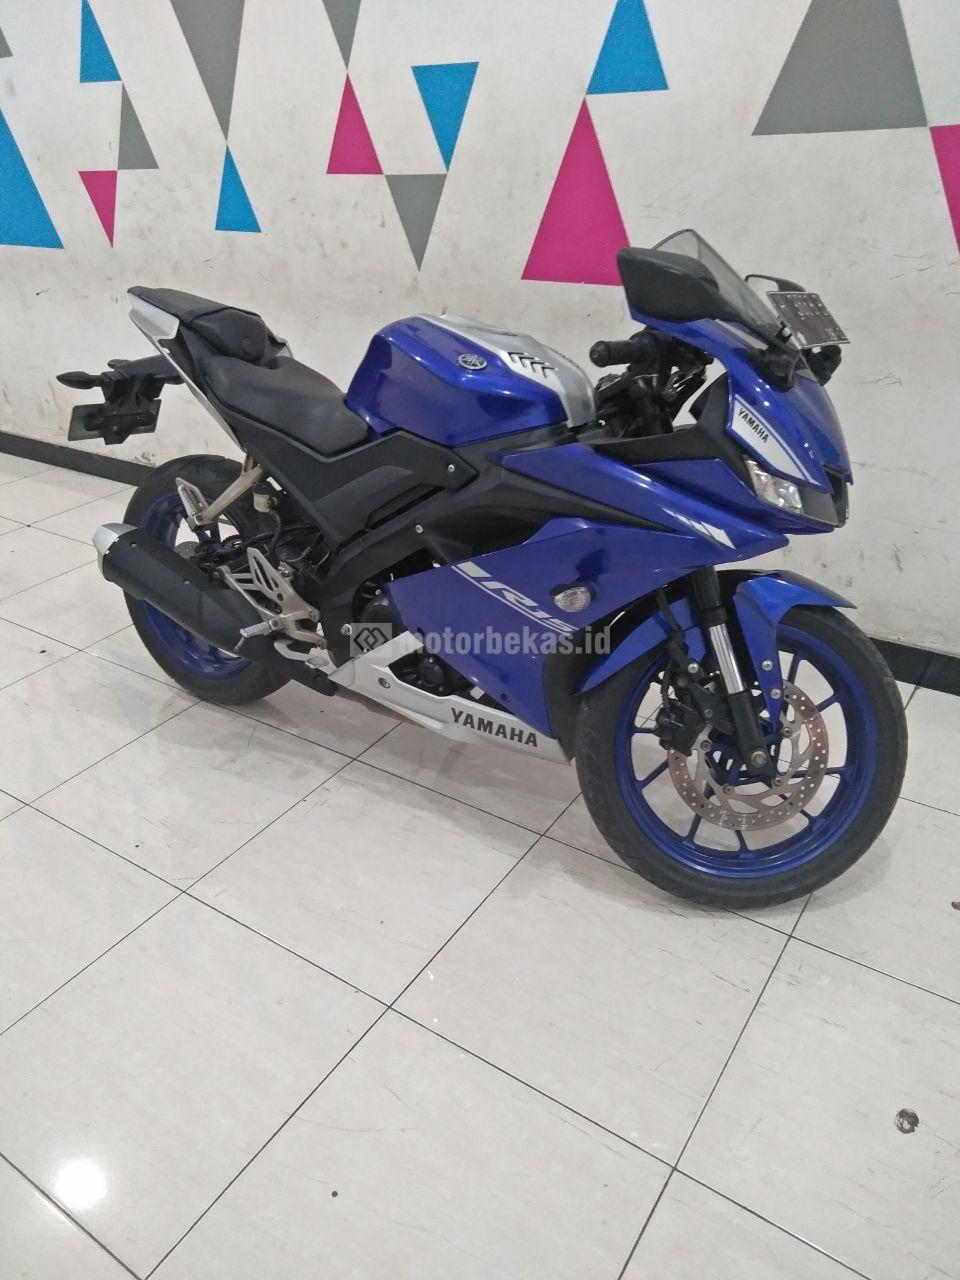 YAMAHA R15 V3 MOVISTAR  3085 motorbekas.id